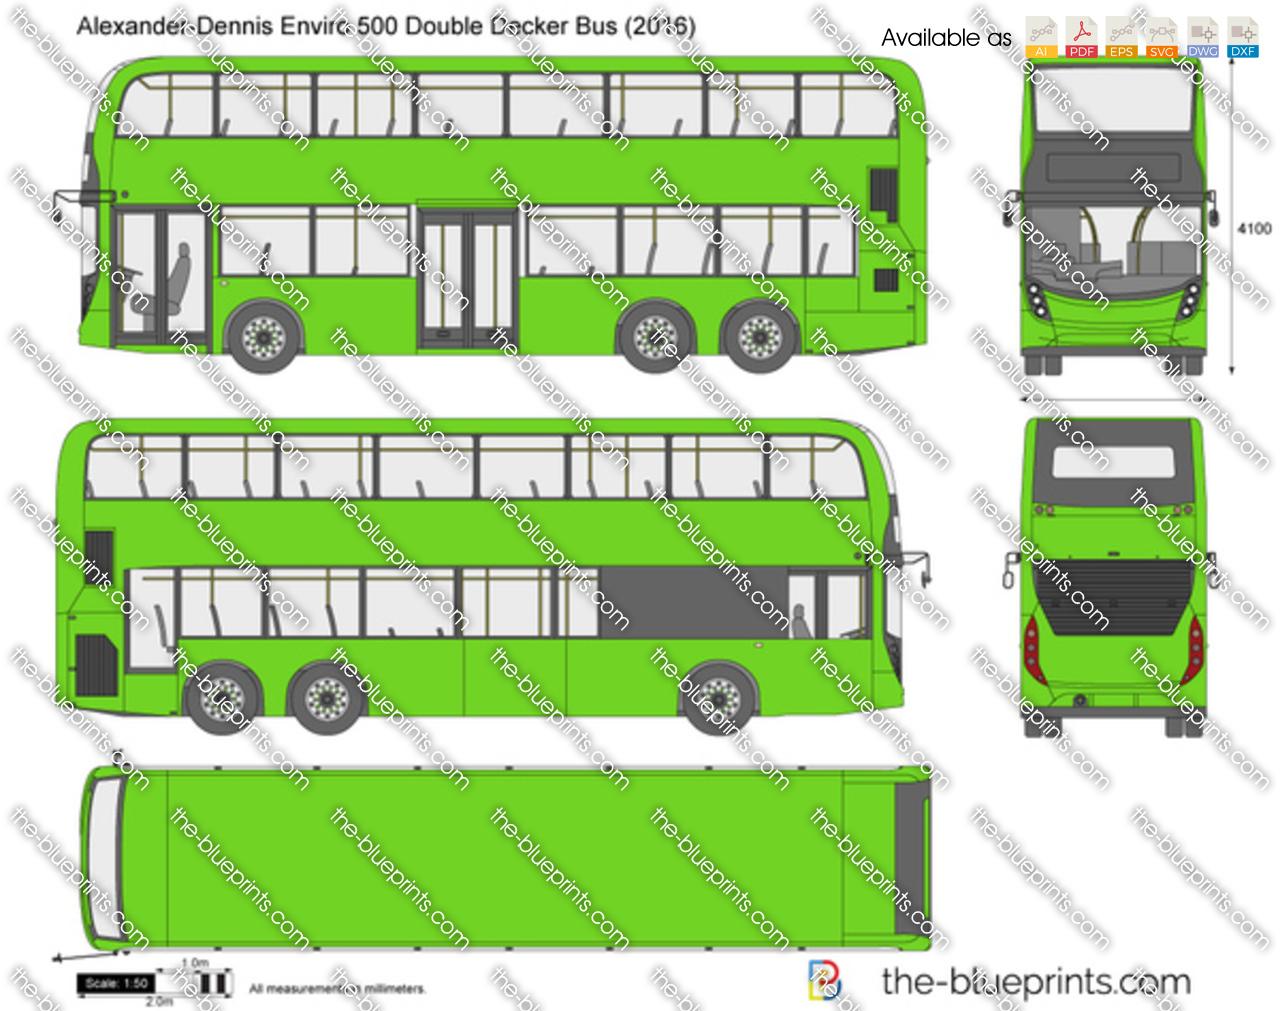 Alexander-Dennis Enviro 500 Double Decker Bus 2018